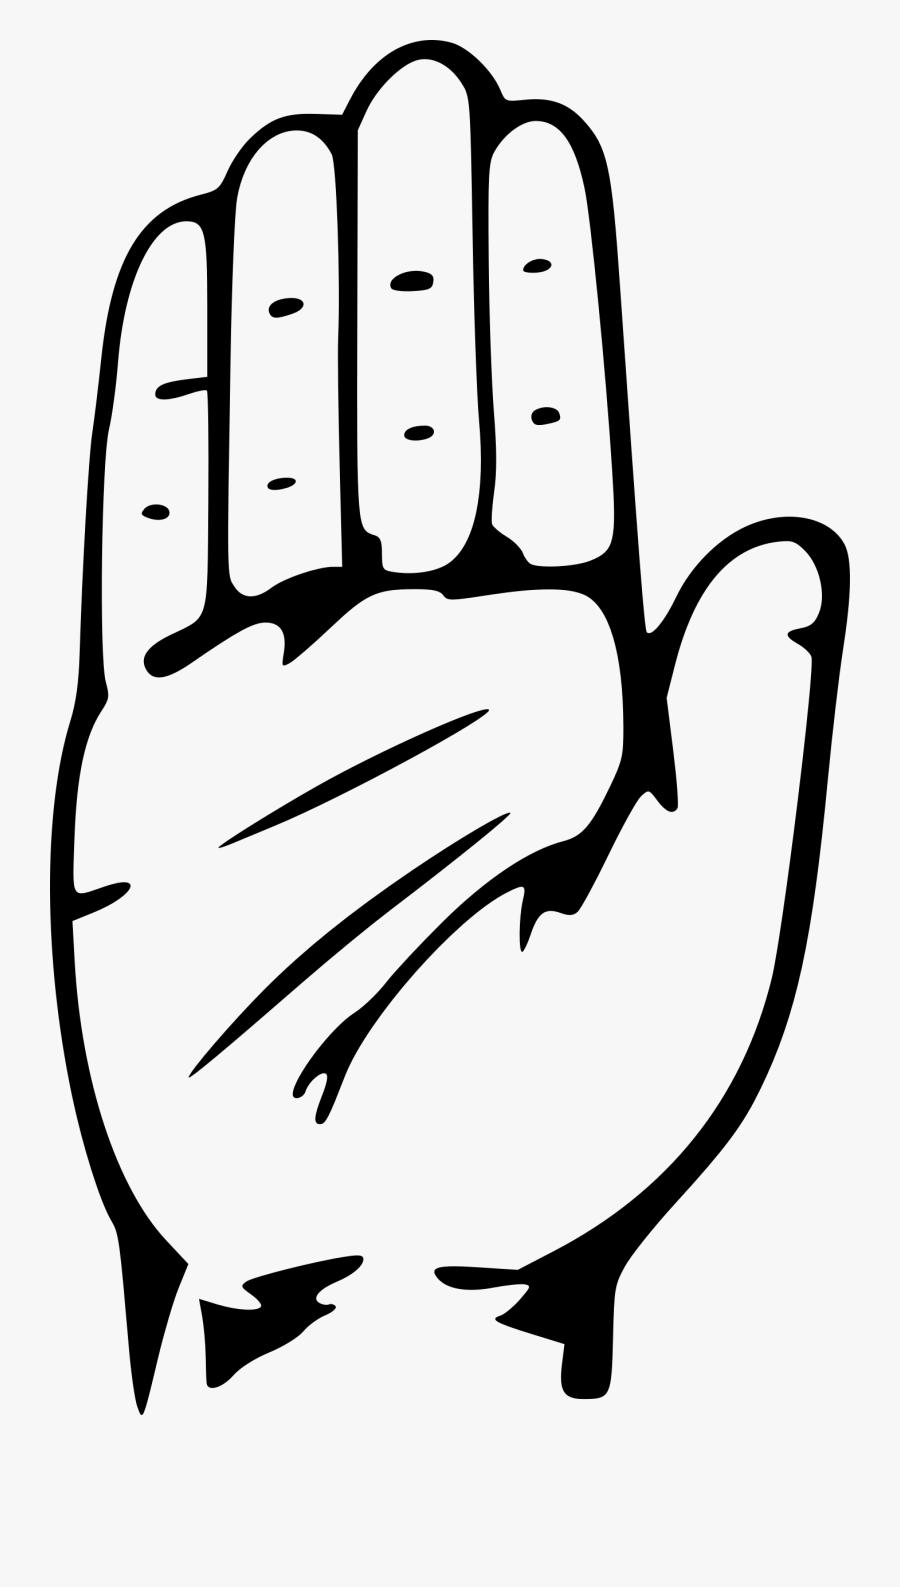 Clipart - Symbol Of Indian National Congress, Transparent Clipart